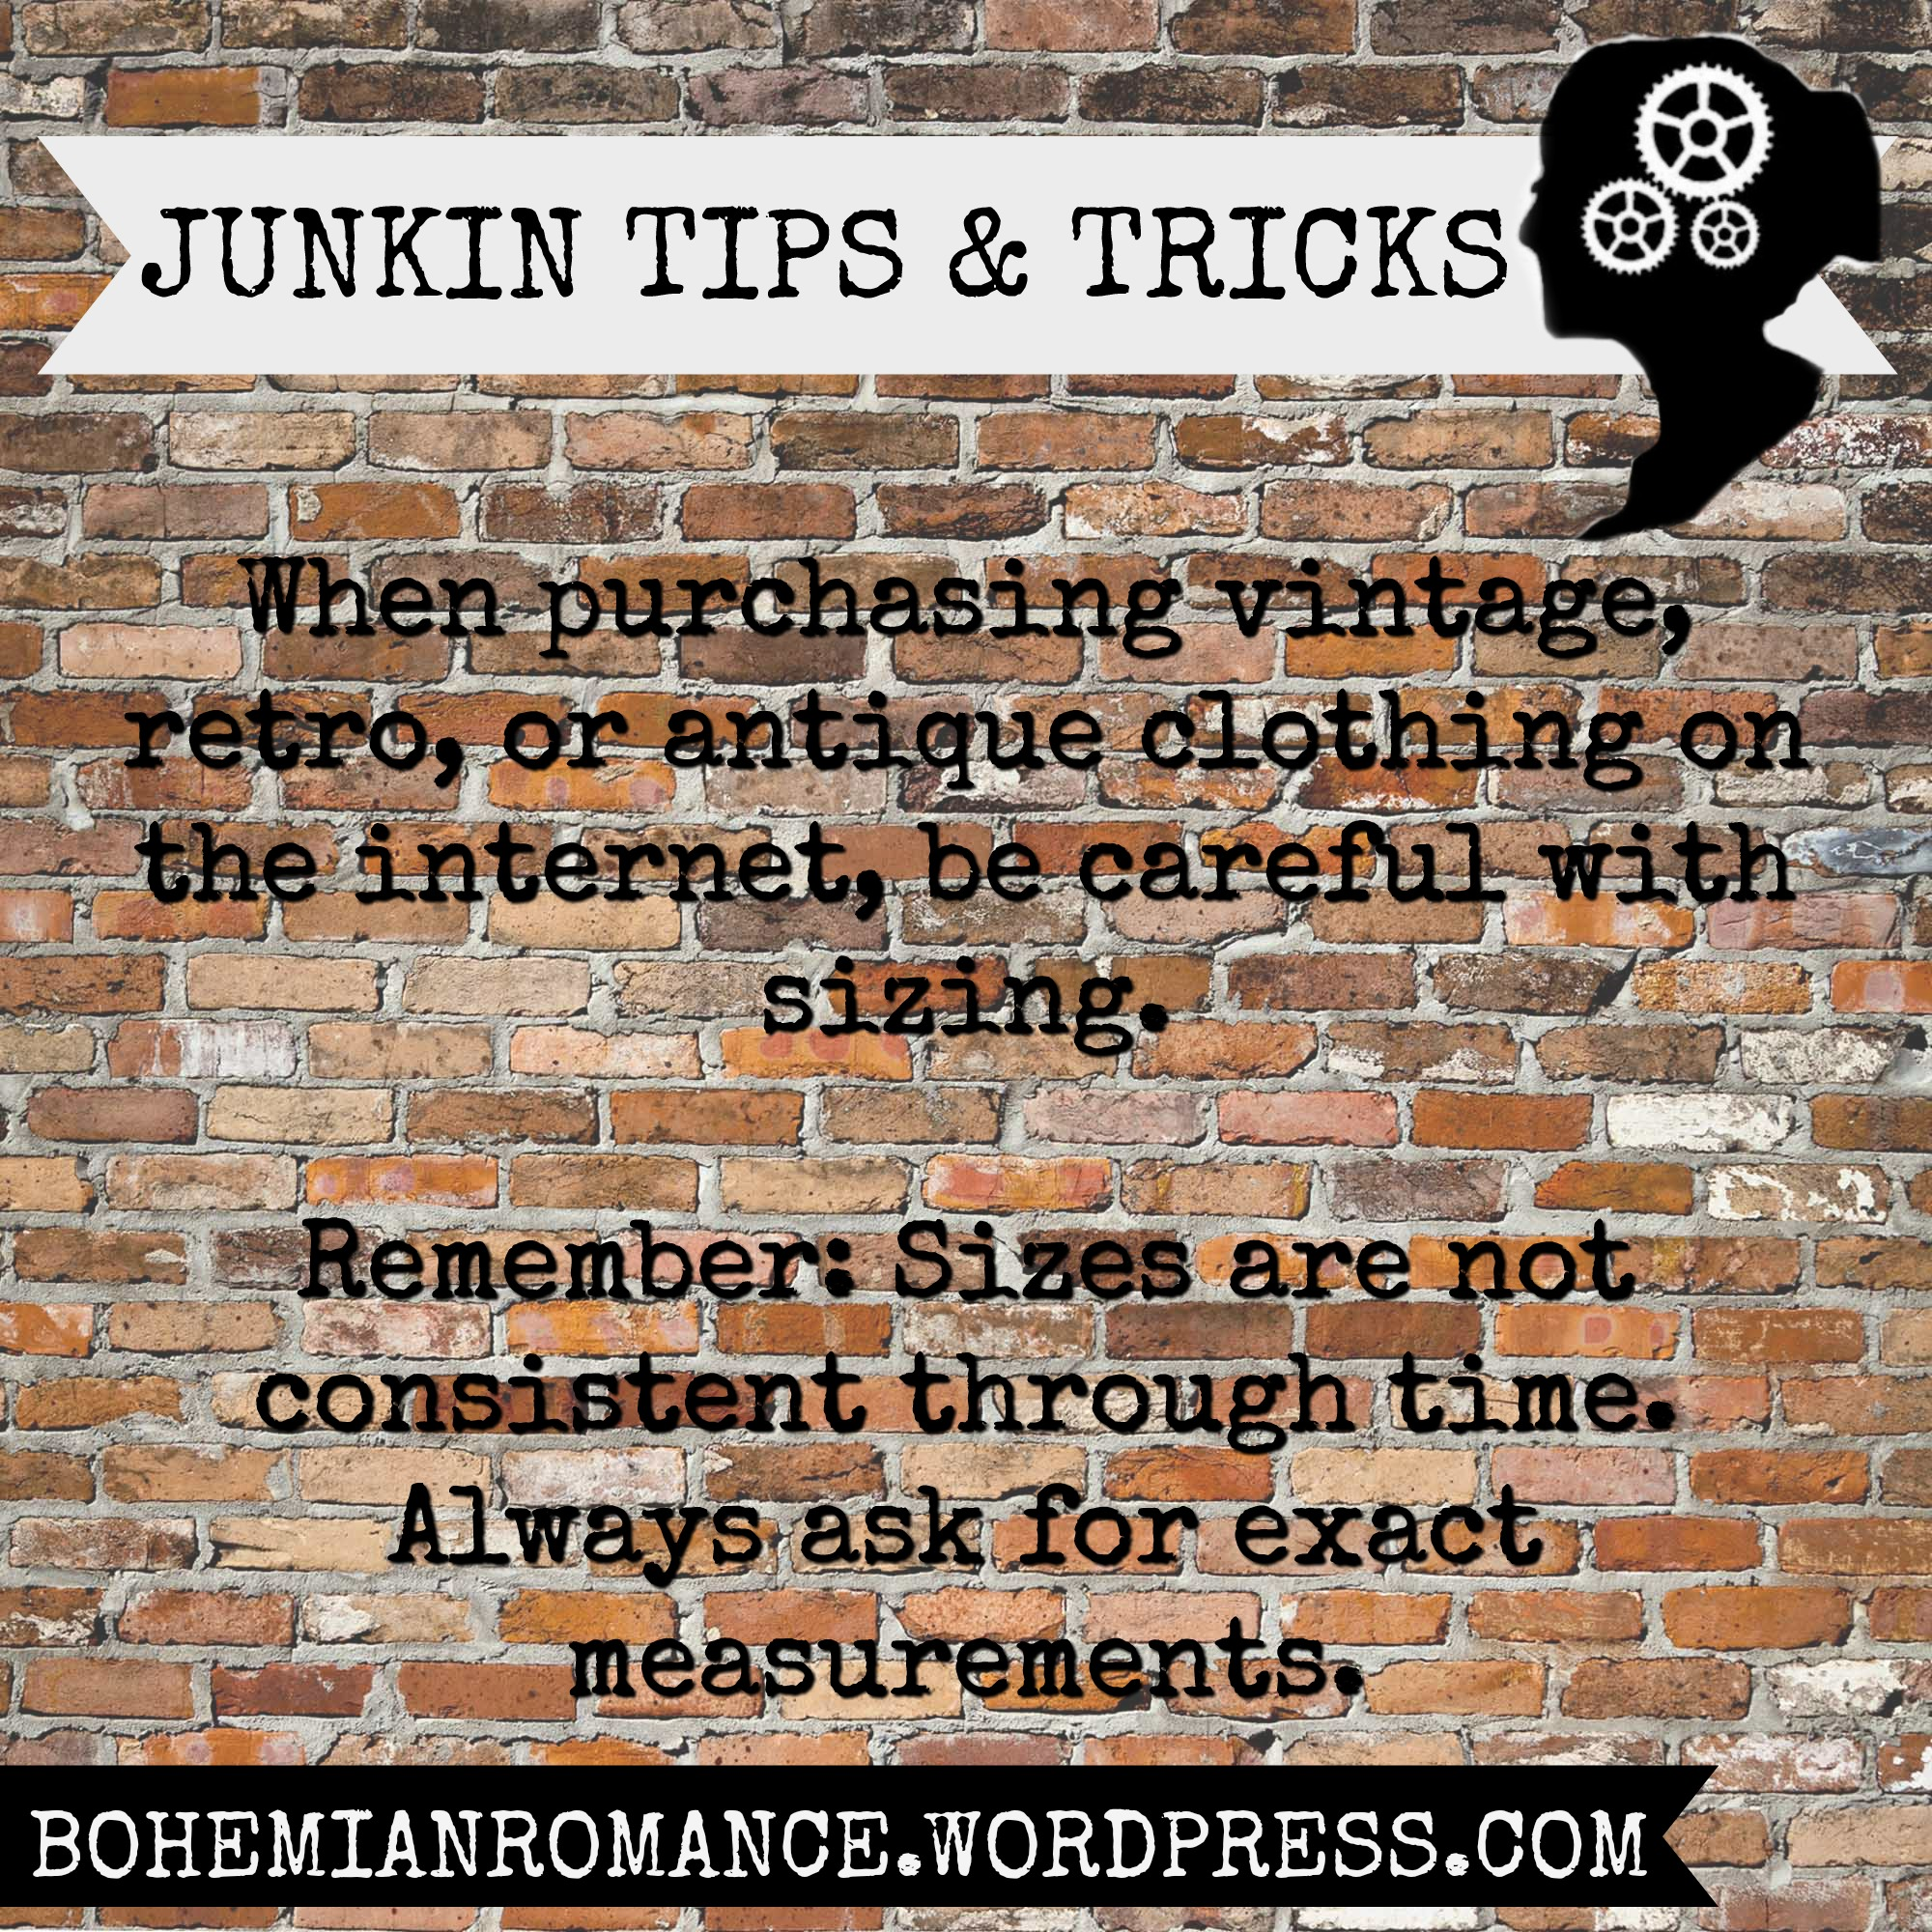 37-junkin-tips-tricks-template